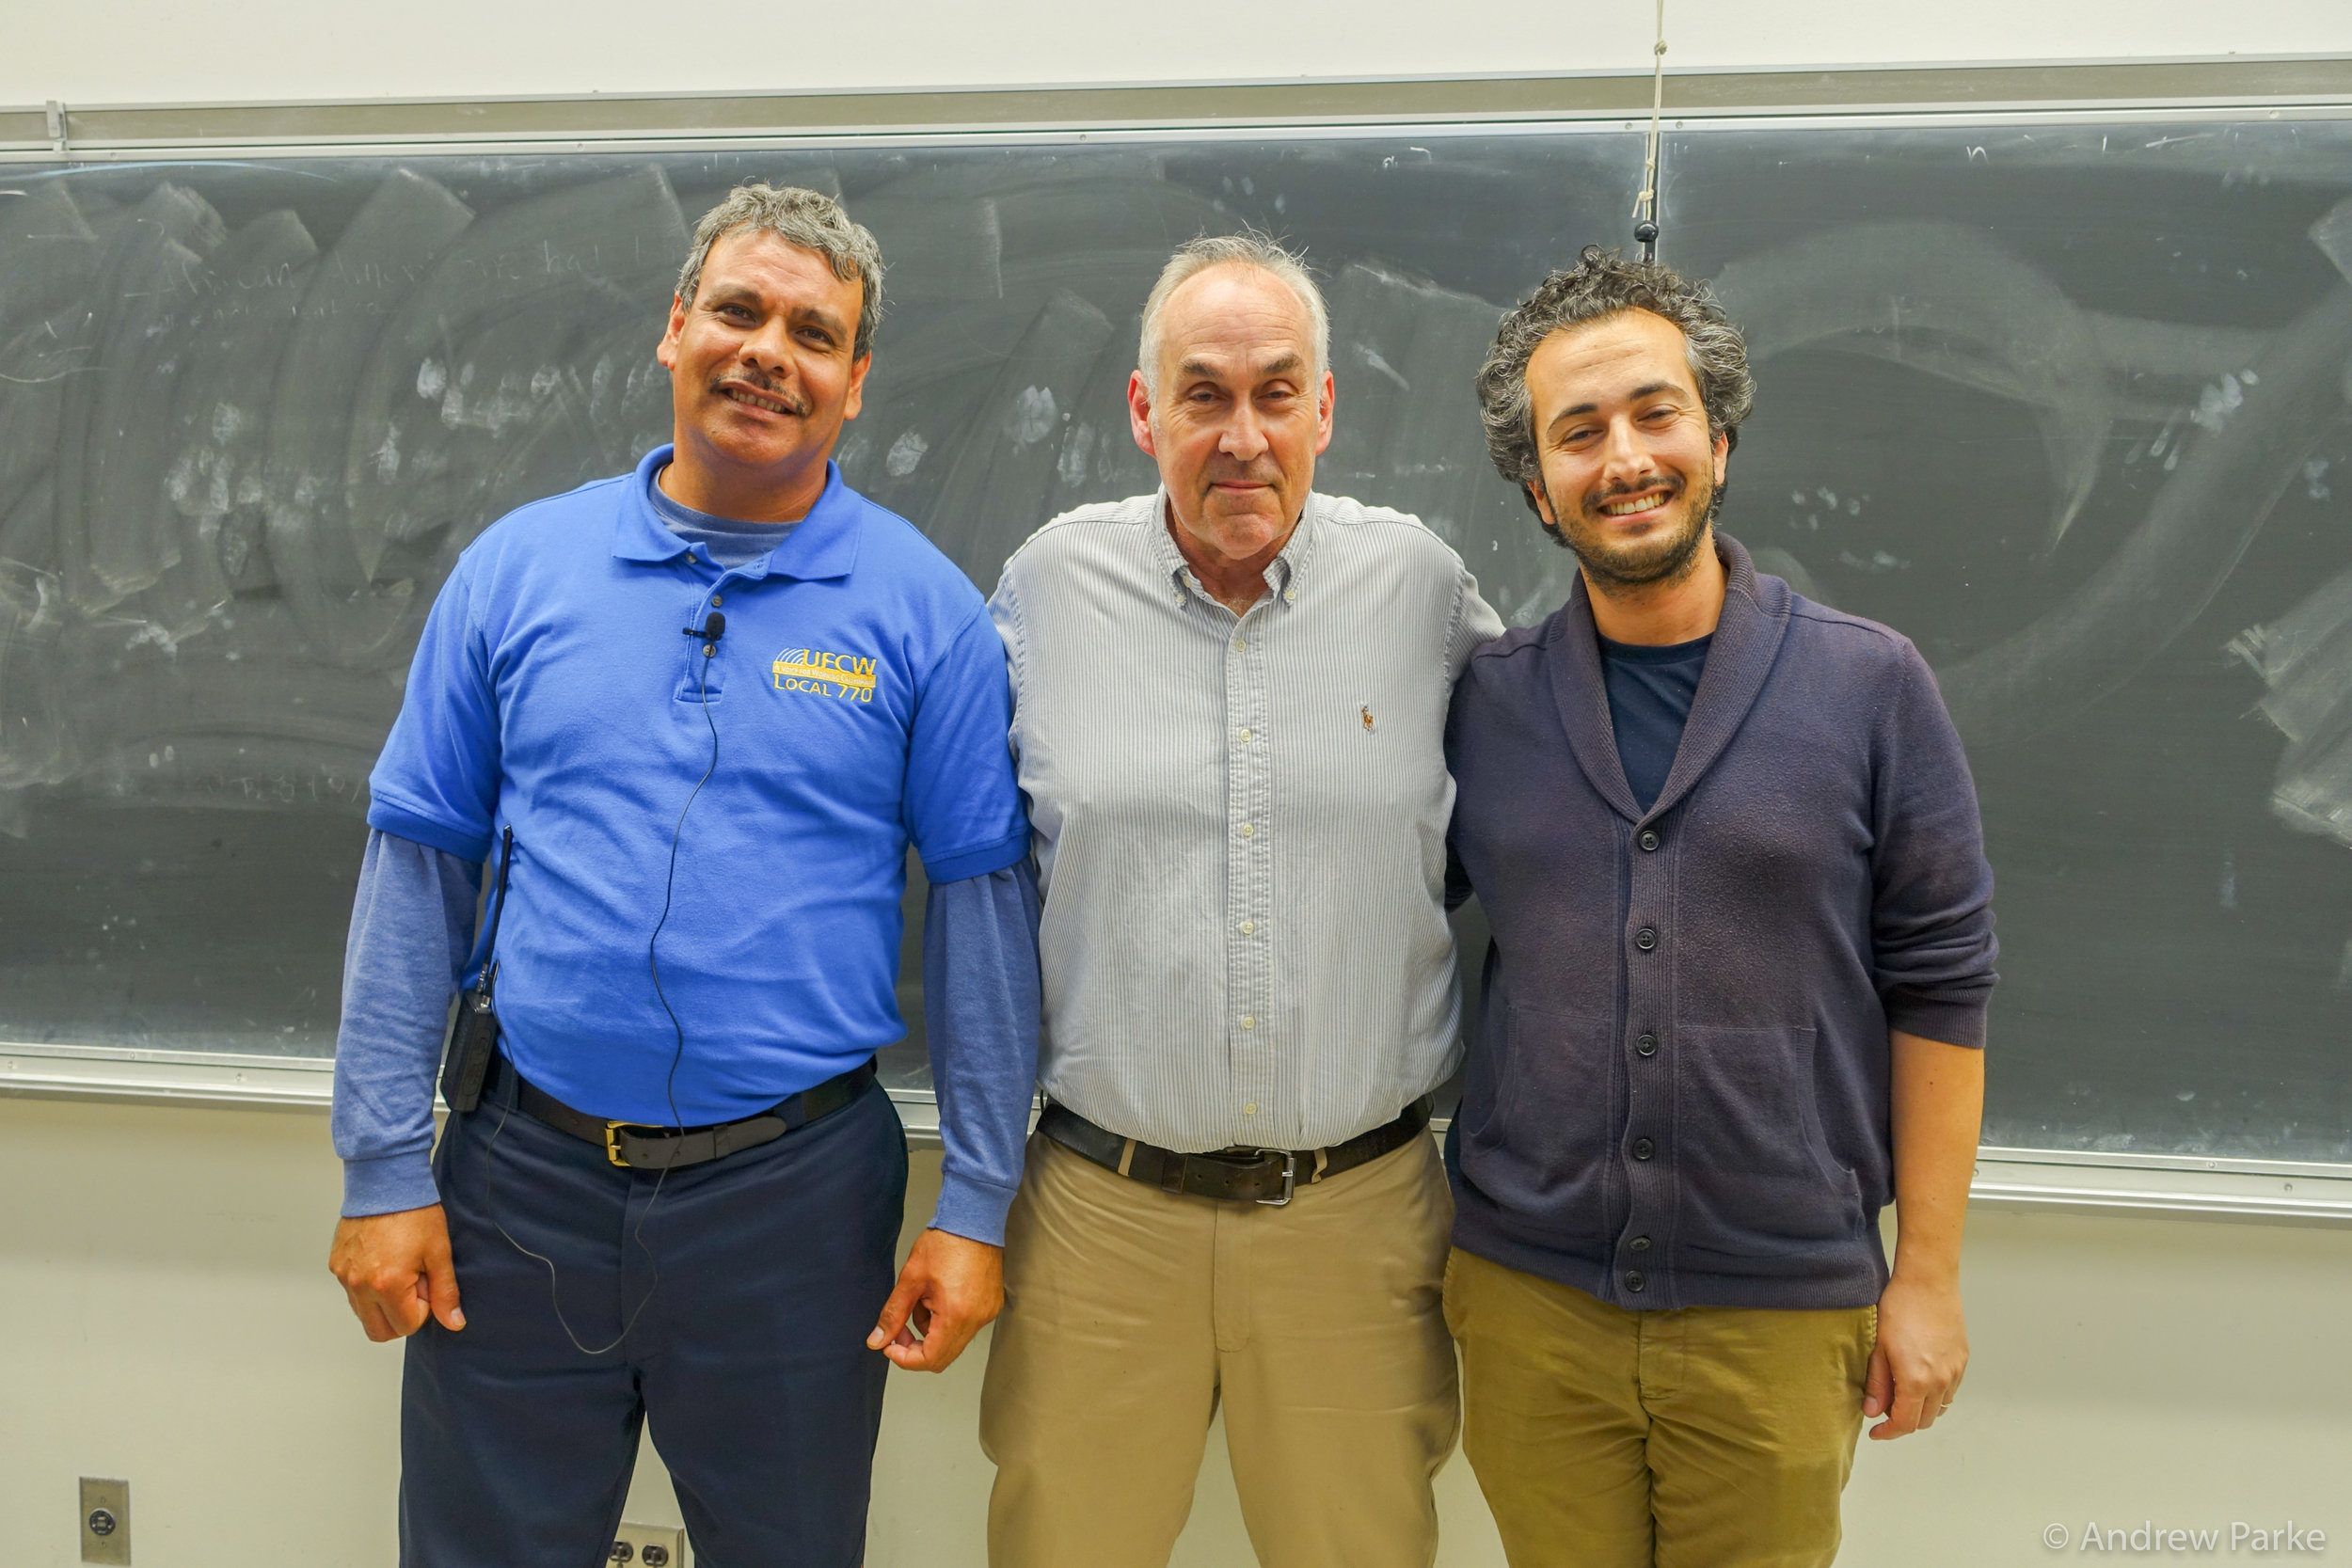 Pedro Alberon, Organizer, UFCW; Matthew Barr; Shukry Cattan, UCLA Labor Center